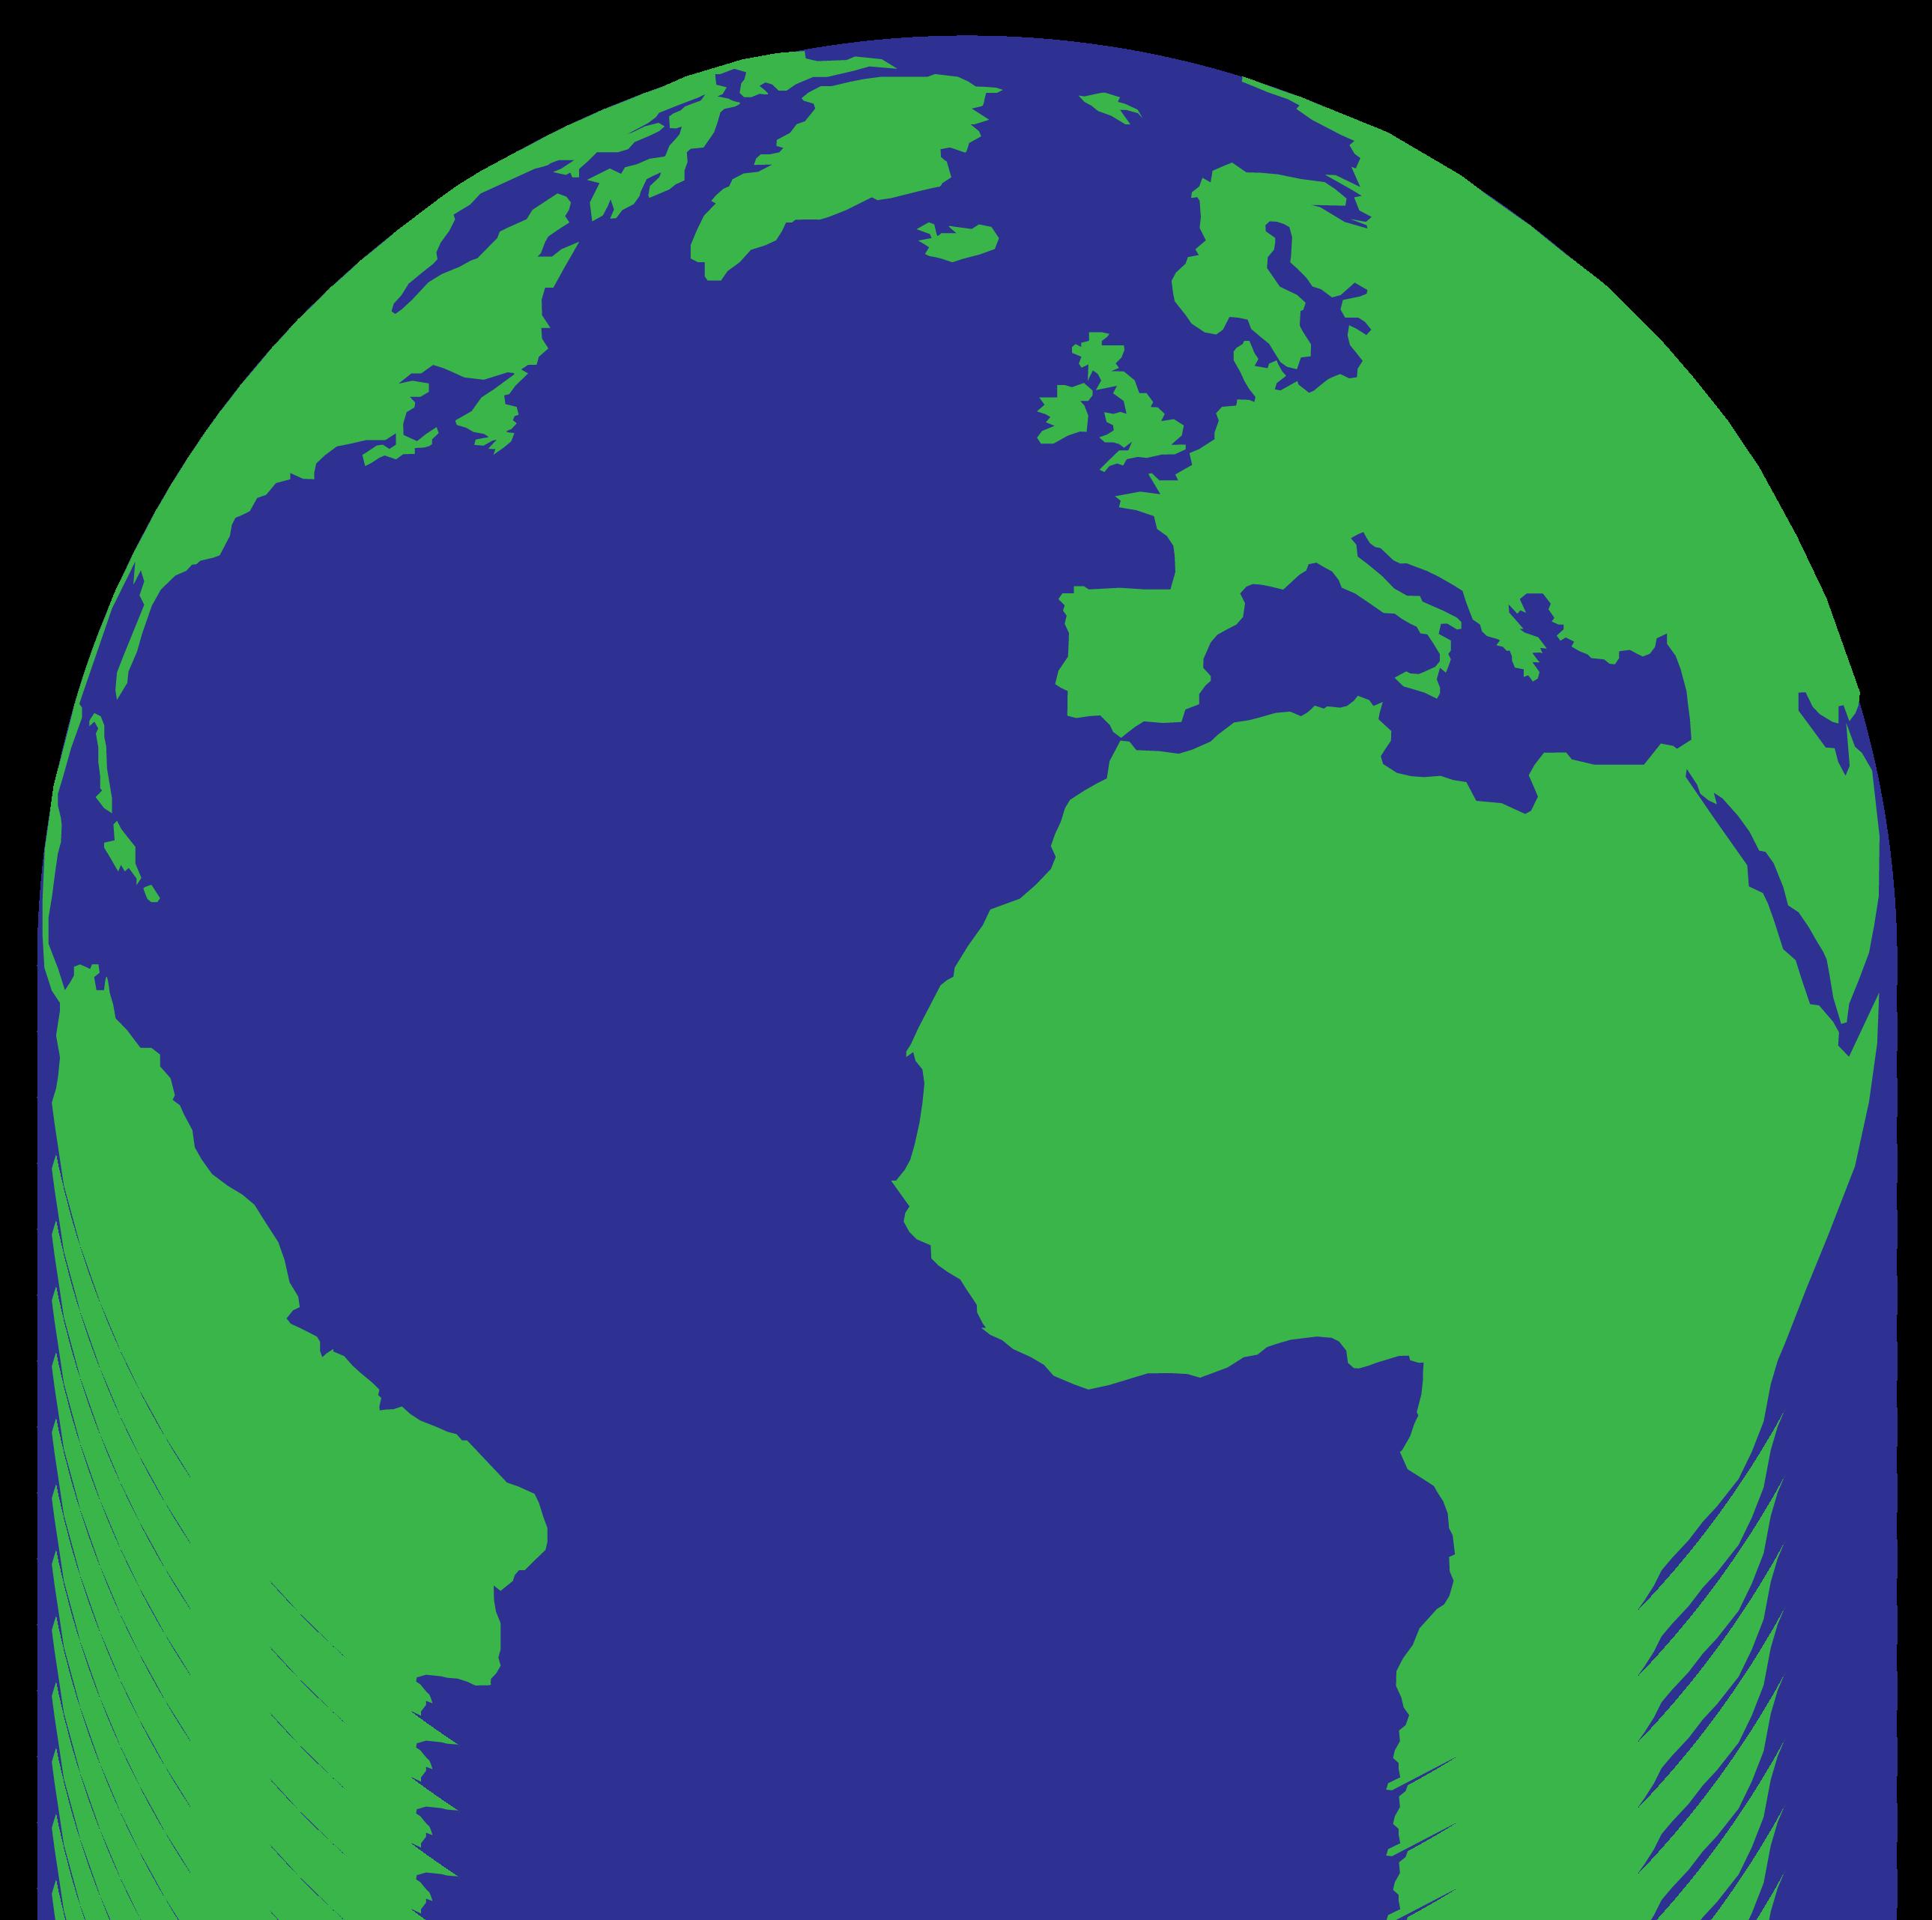 Globe World map Microsoft PowerPoint.